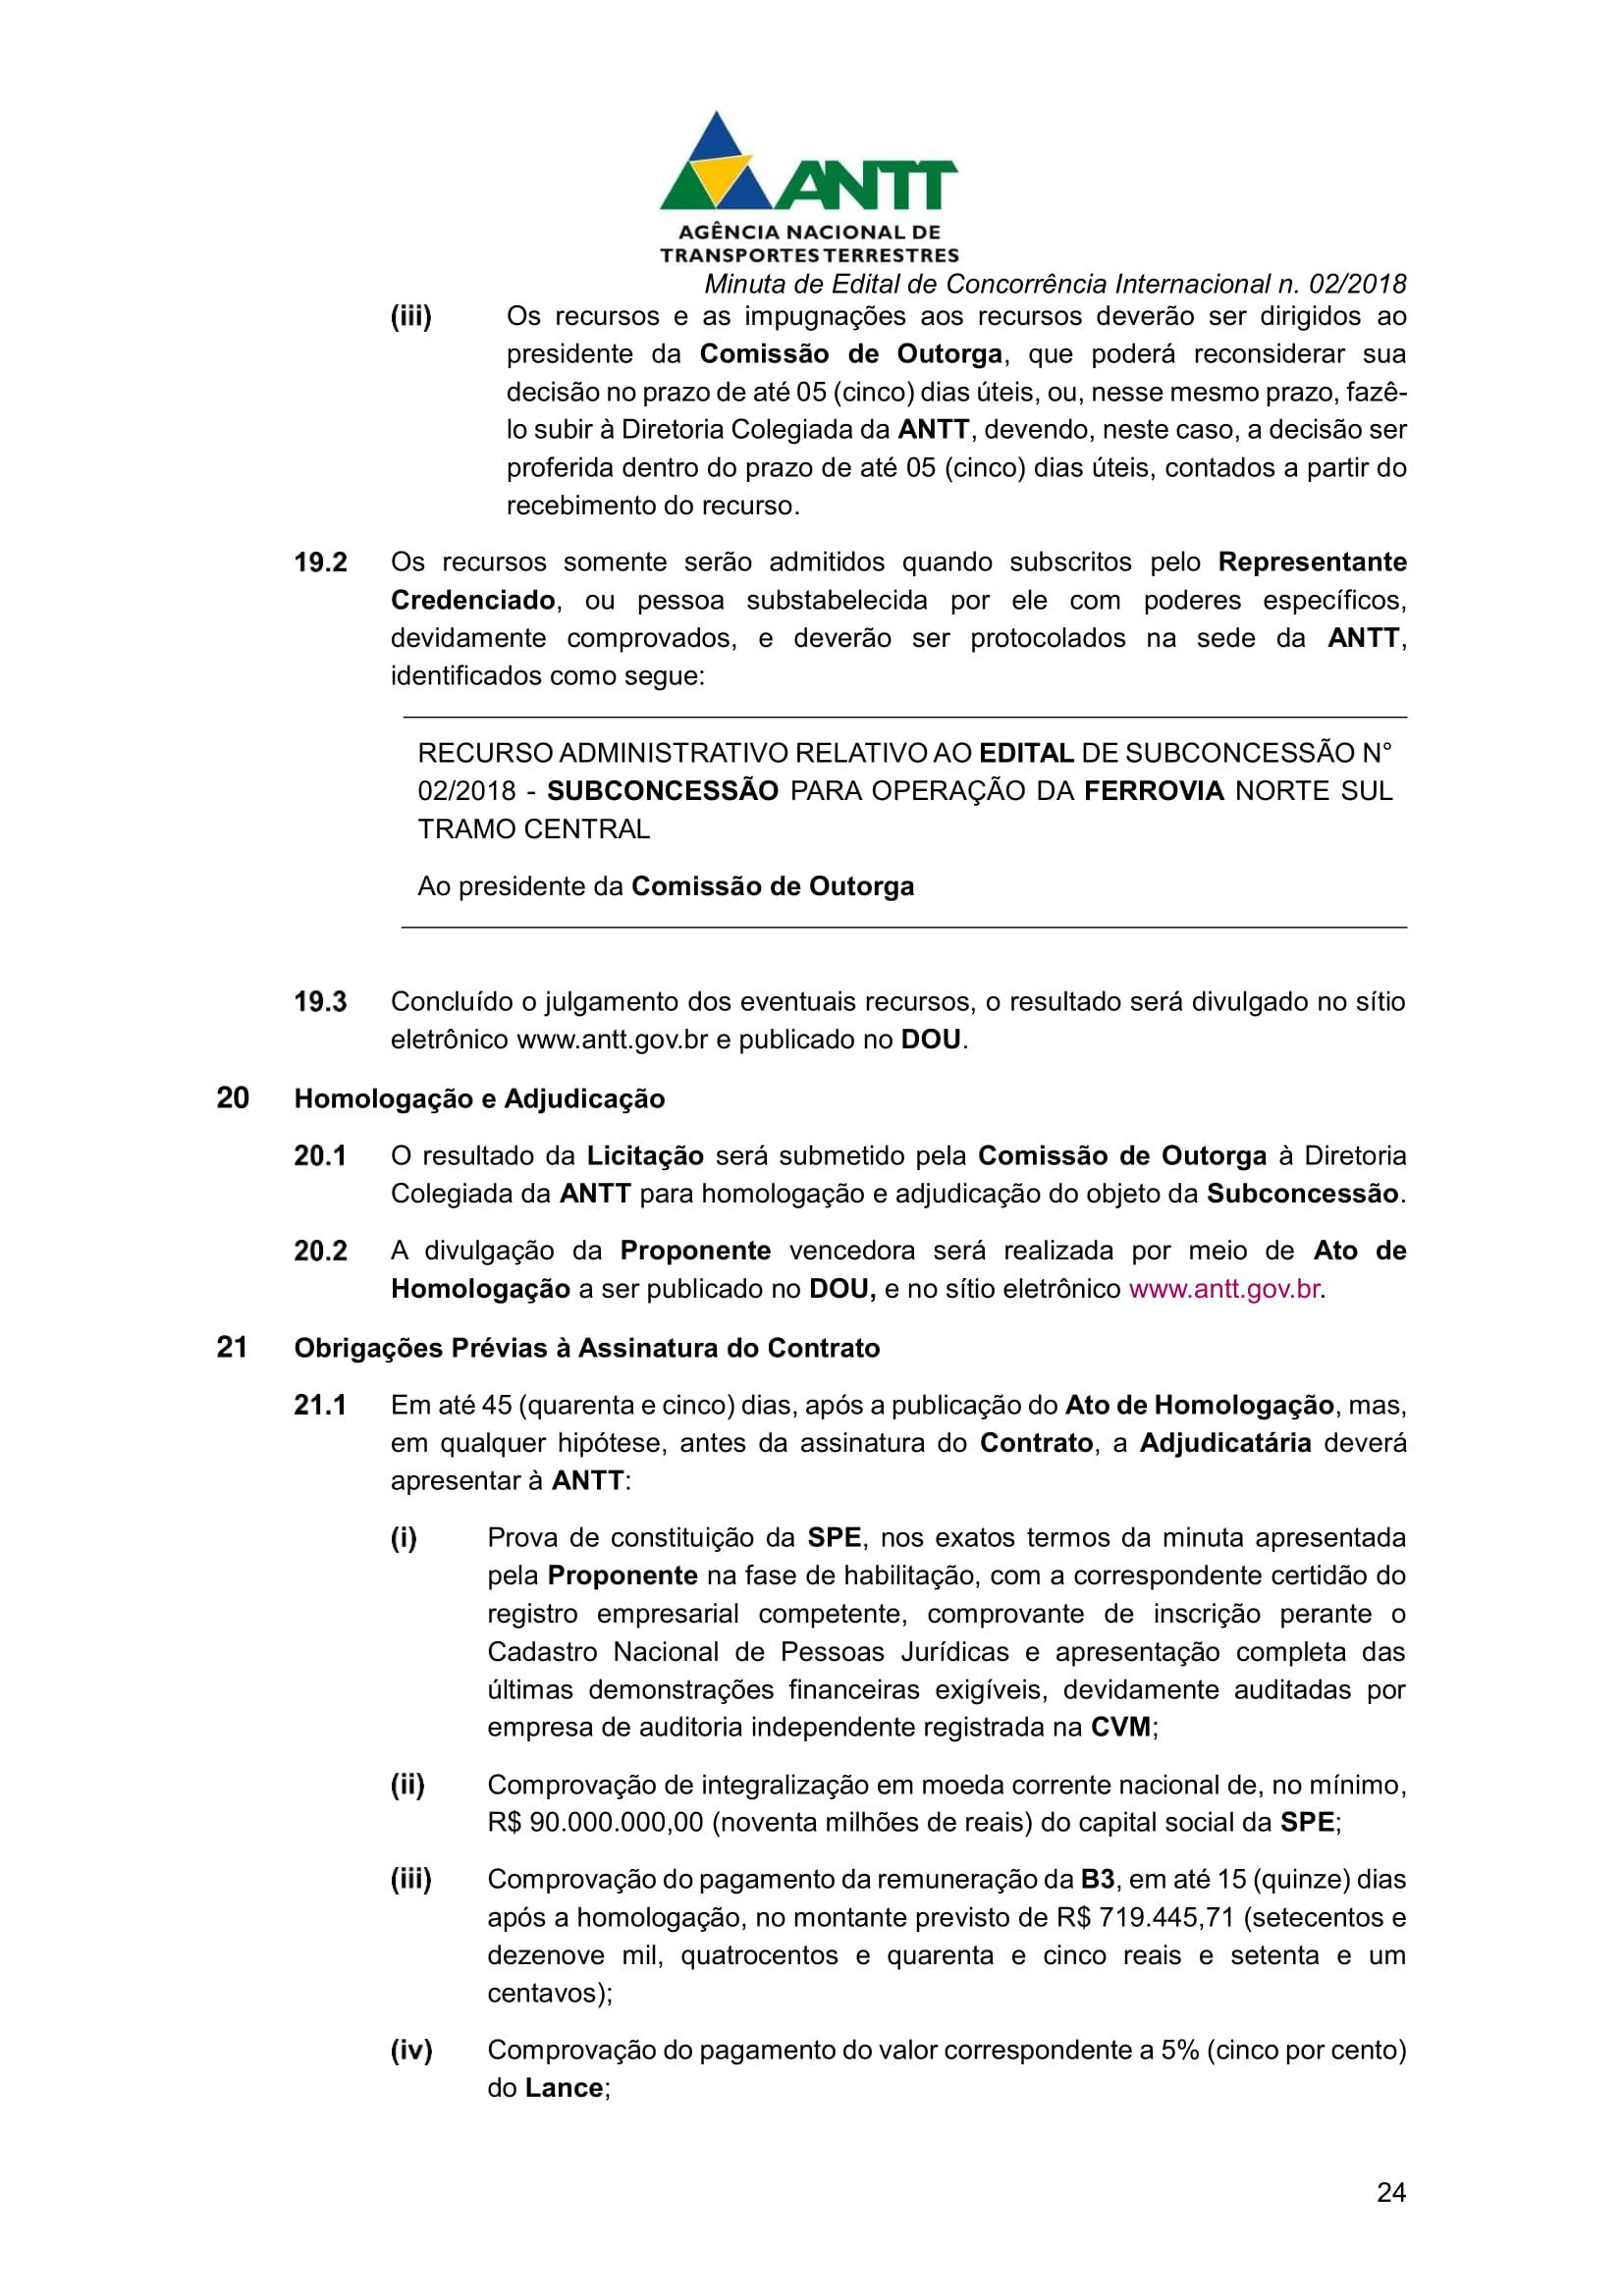 minuta_de_edital_-_porto_nacional-estrela_doeste-24